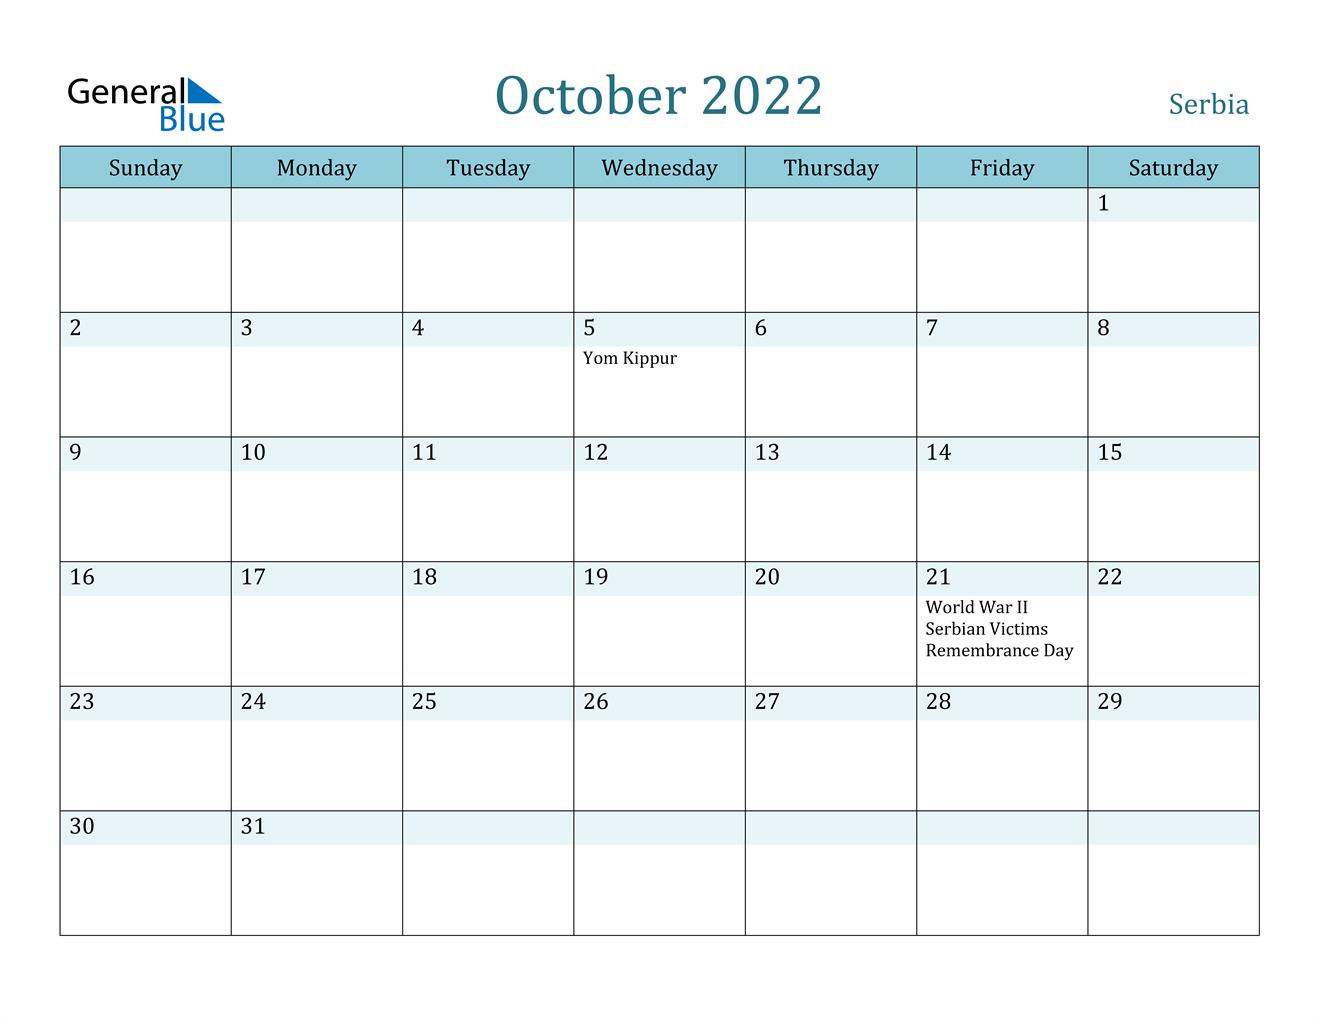 October 2022 Calendar - Serbia